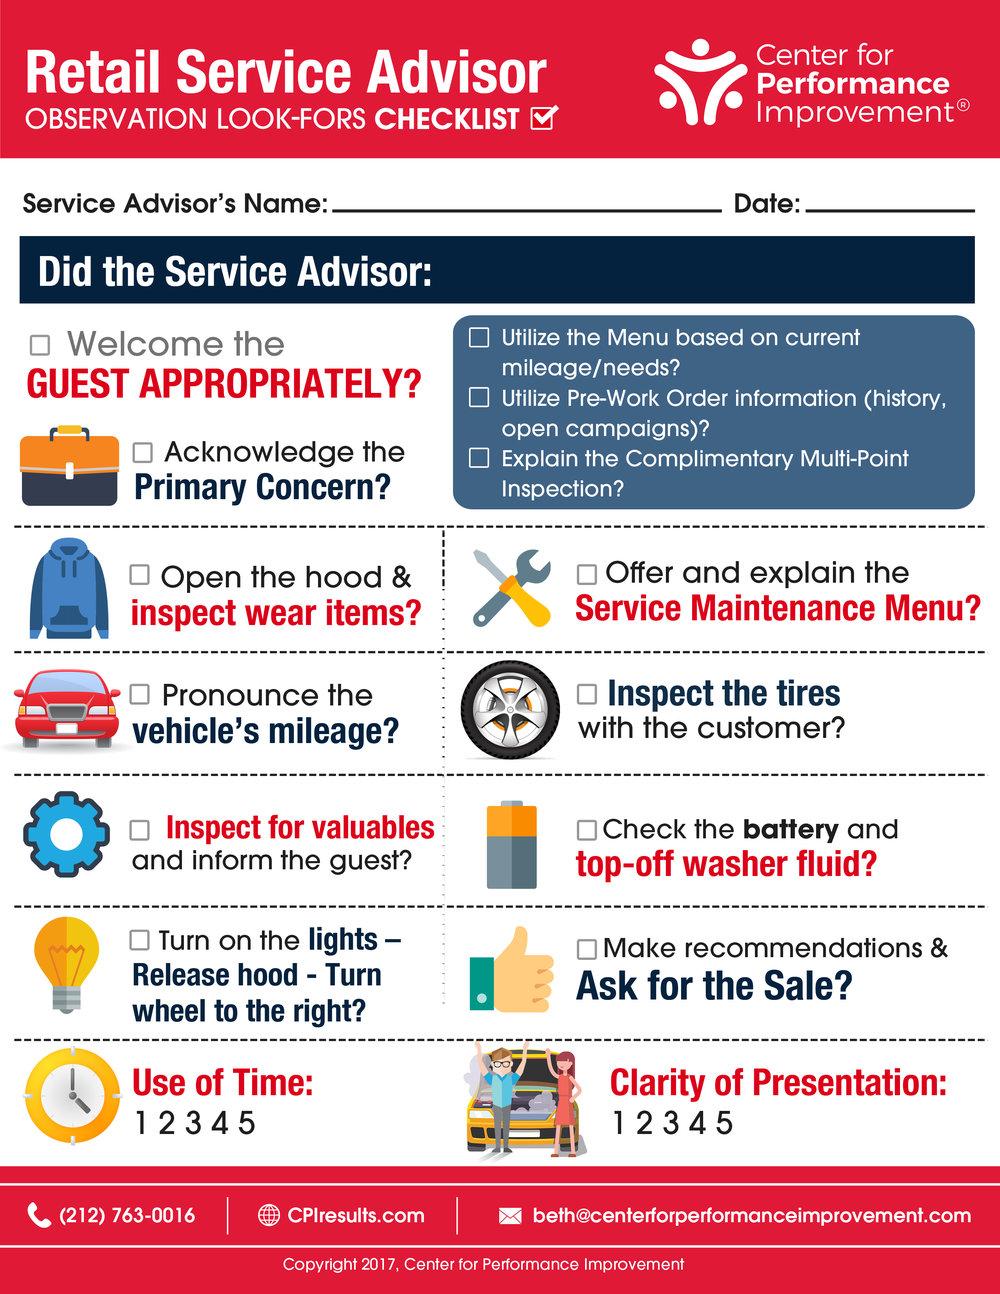 Service_Advisor_Checklist.jpg